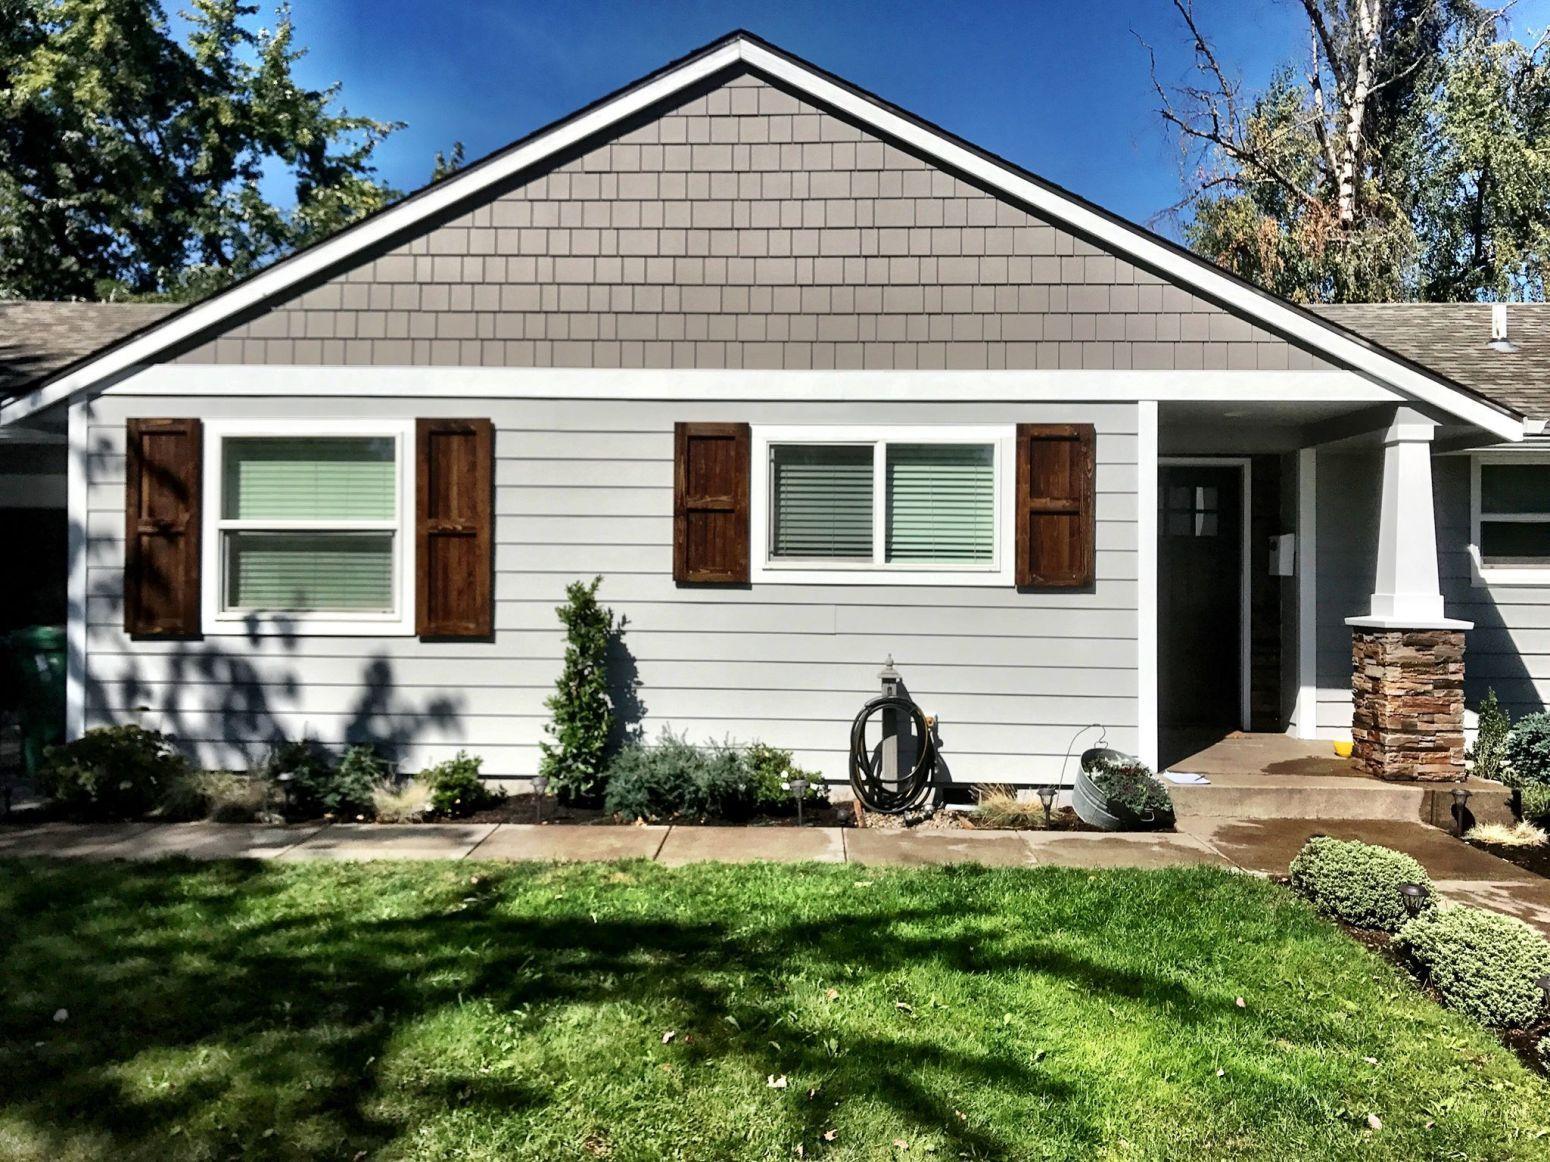 Diy exterior shutters adding curb appeal diy exterior